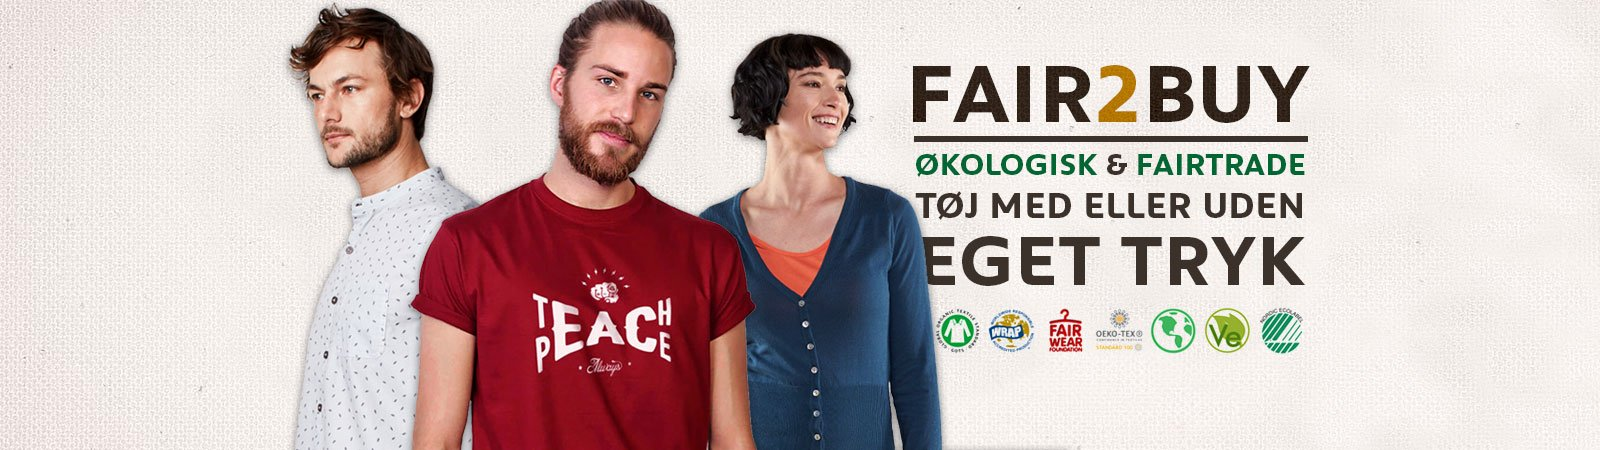 Økologisk Og Fairtrade Tøj Hos Fair2buy